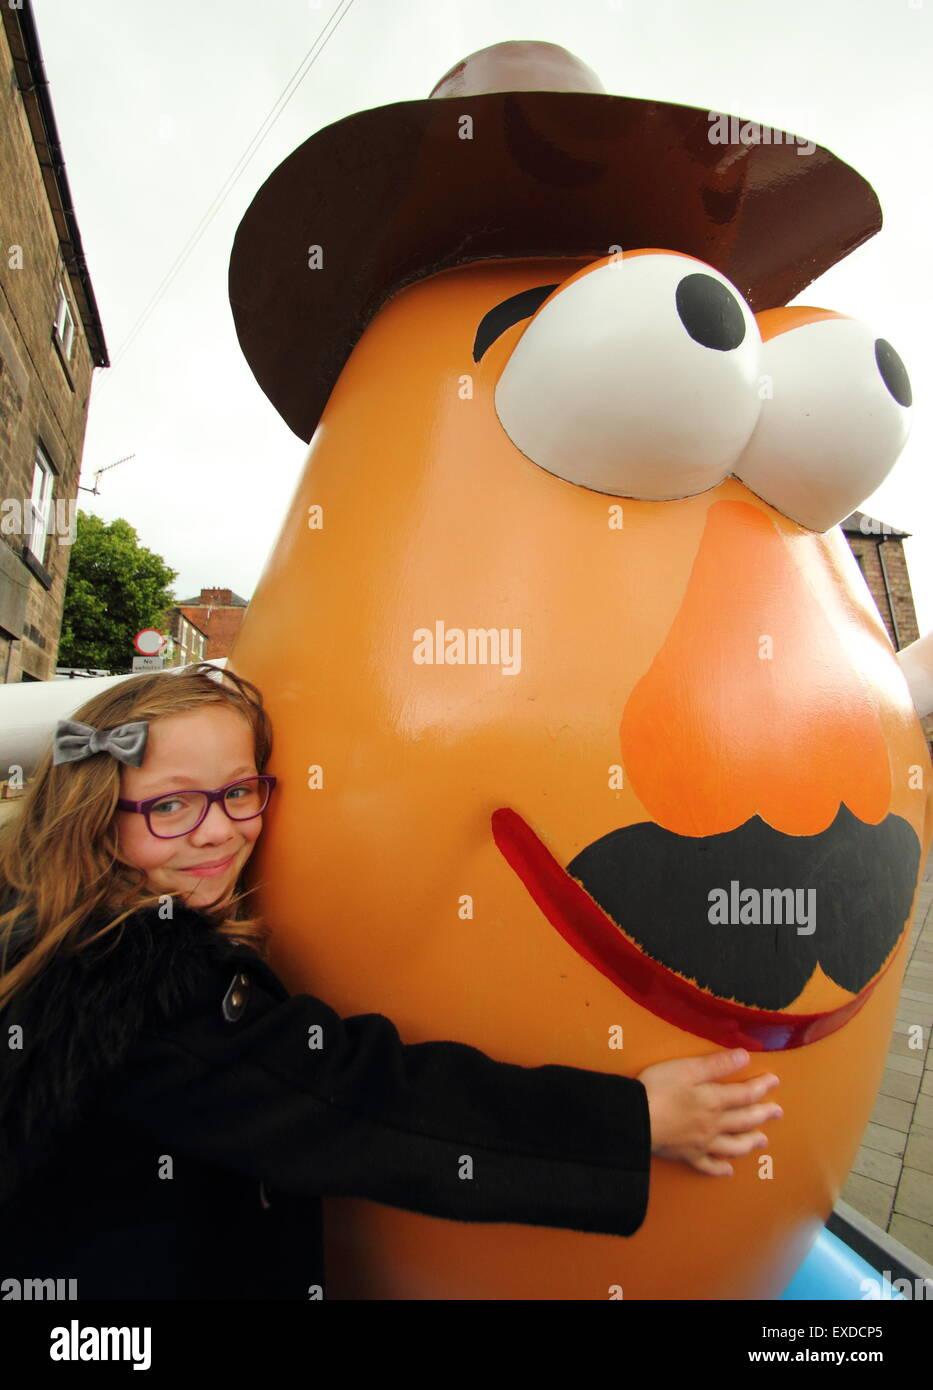 Belper, Derbyshire, UK. 12th July, 2015. Brii Matheson, 8,from Belper hugs a giant Mr Potato Head that has re-appeared - Stock Image